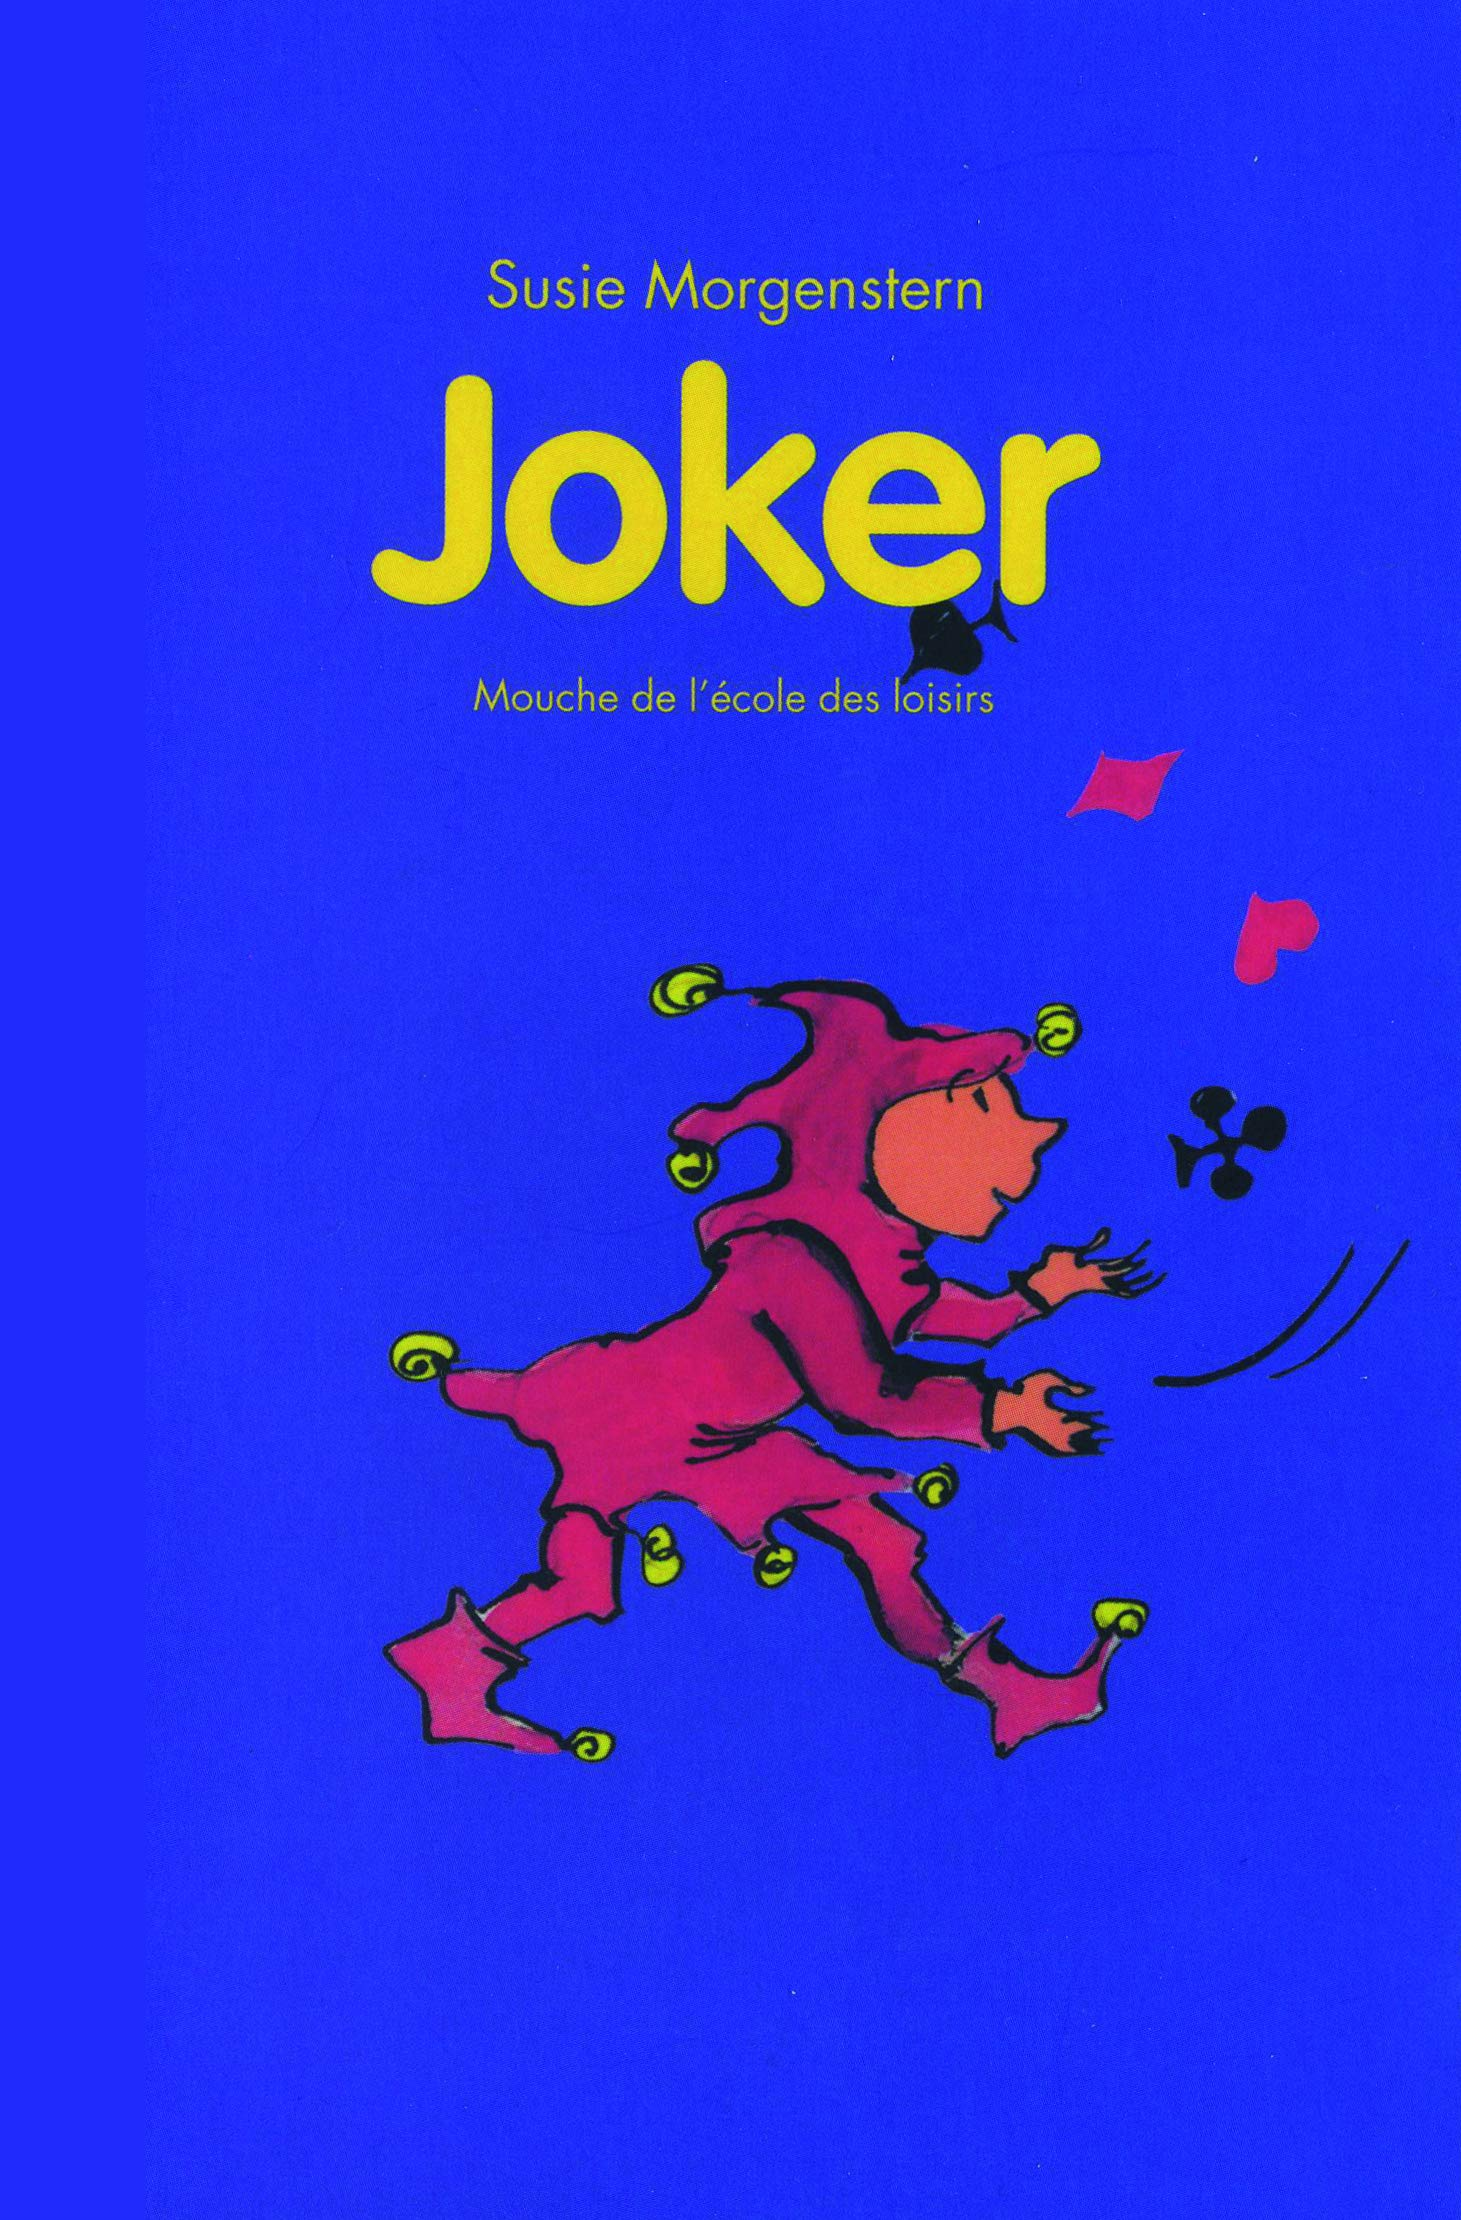 Amazon.fr - Joker - Suzie Morgenstern, Mireille d'Allancé - Livres